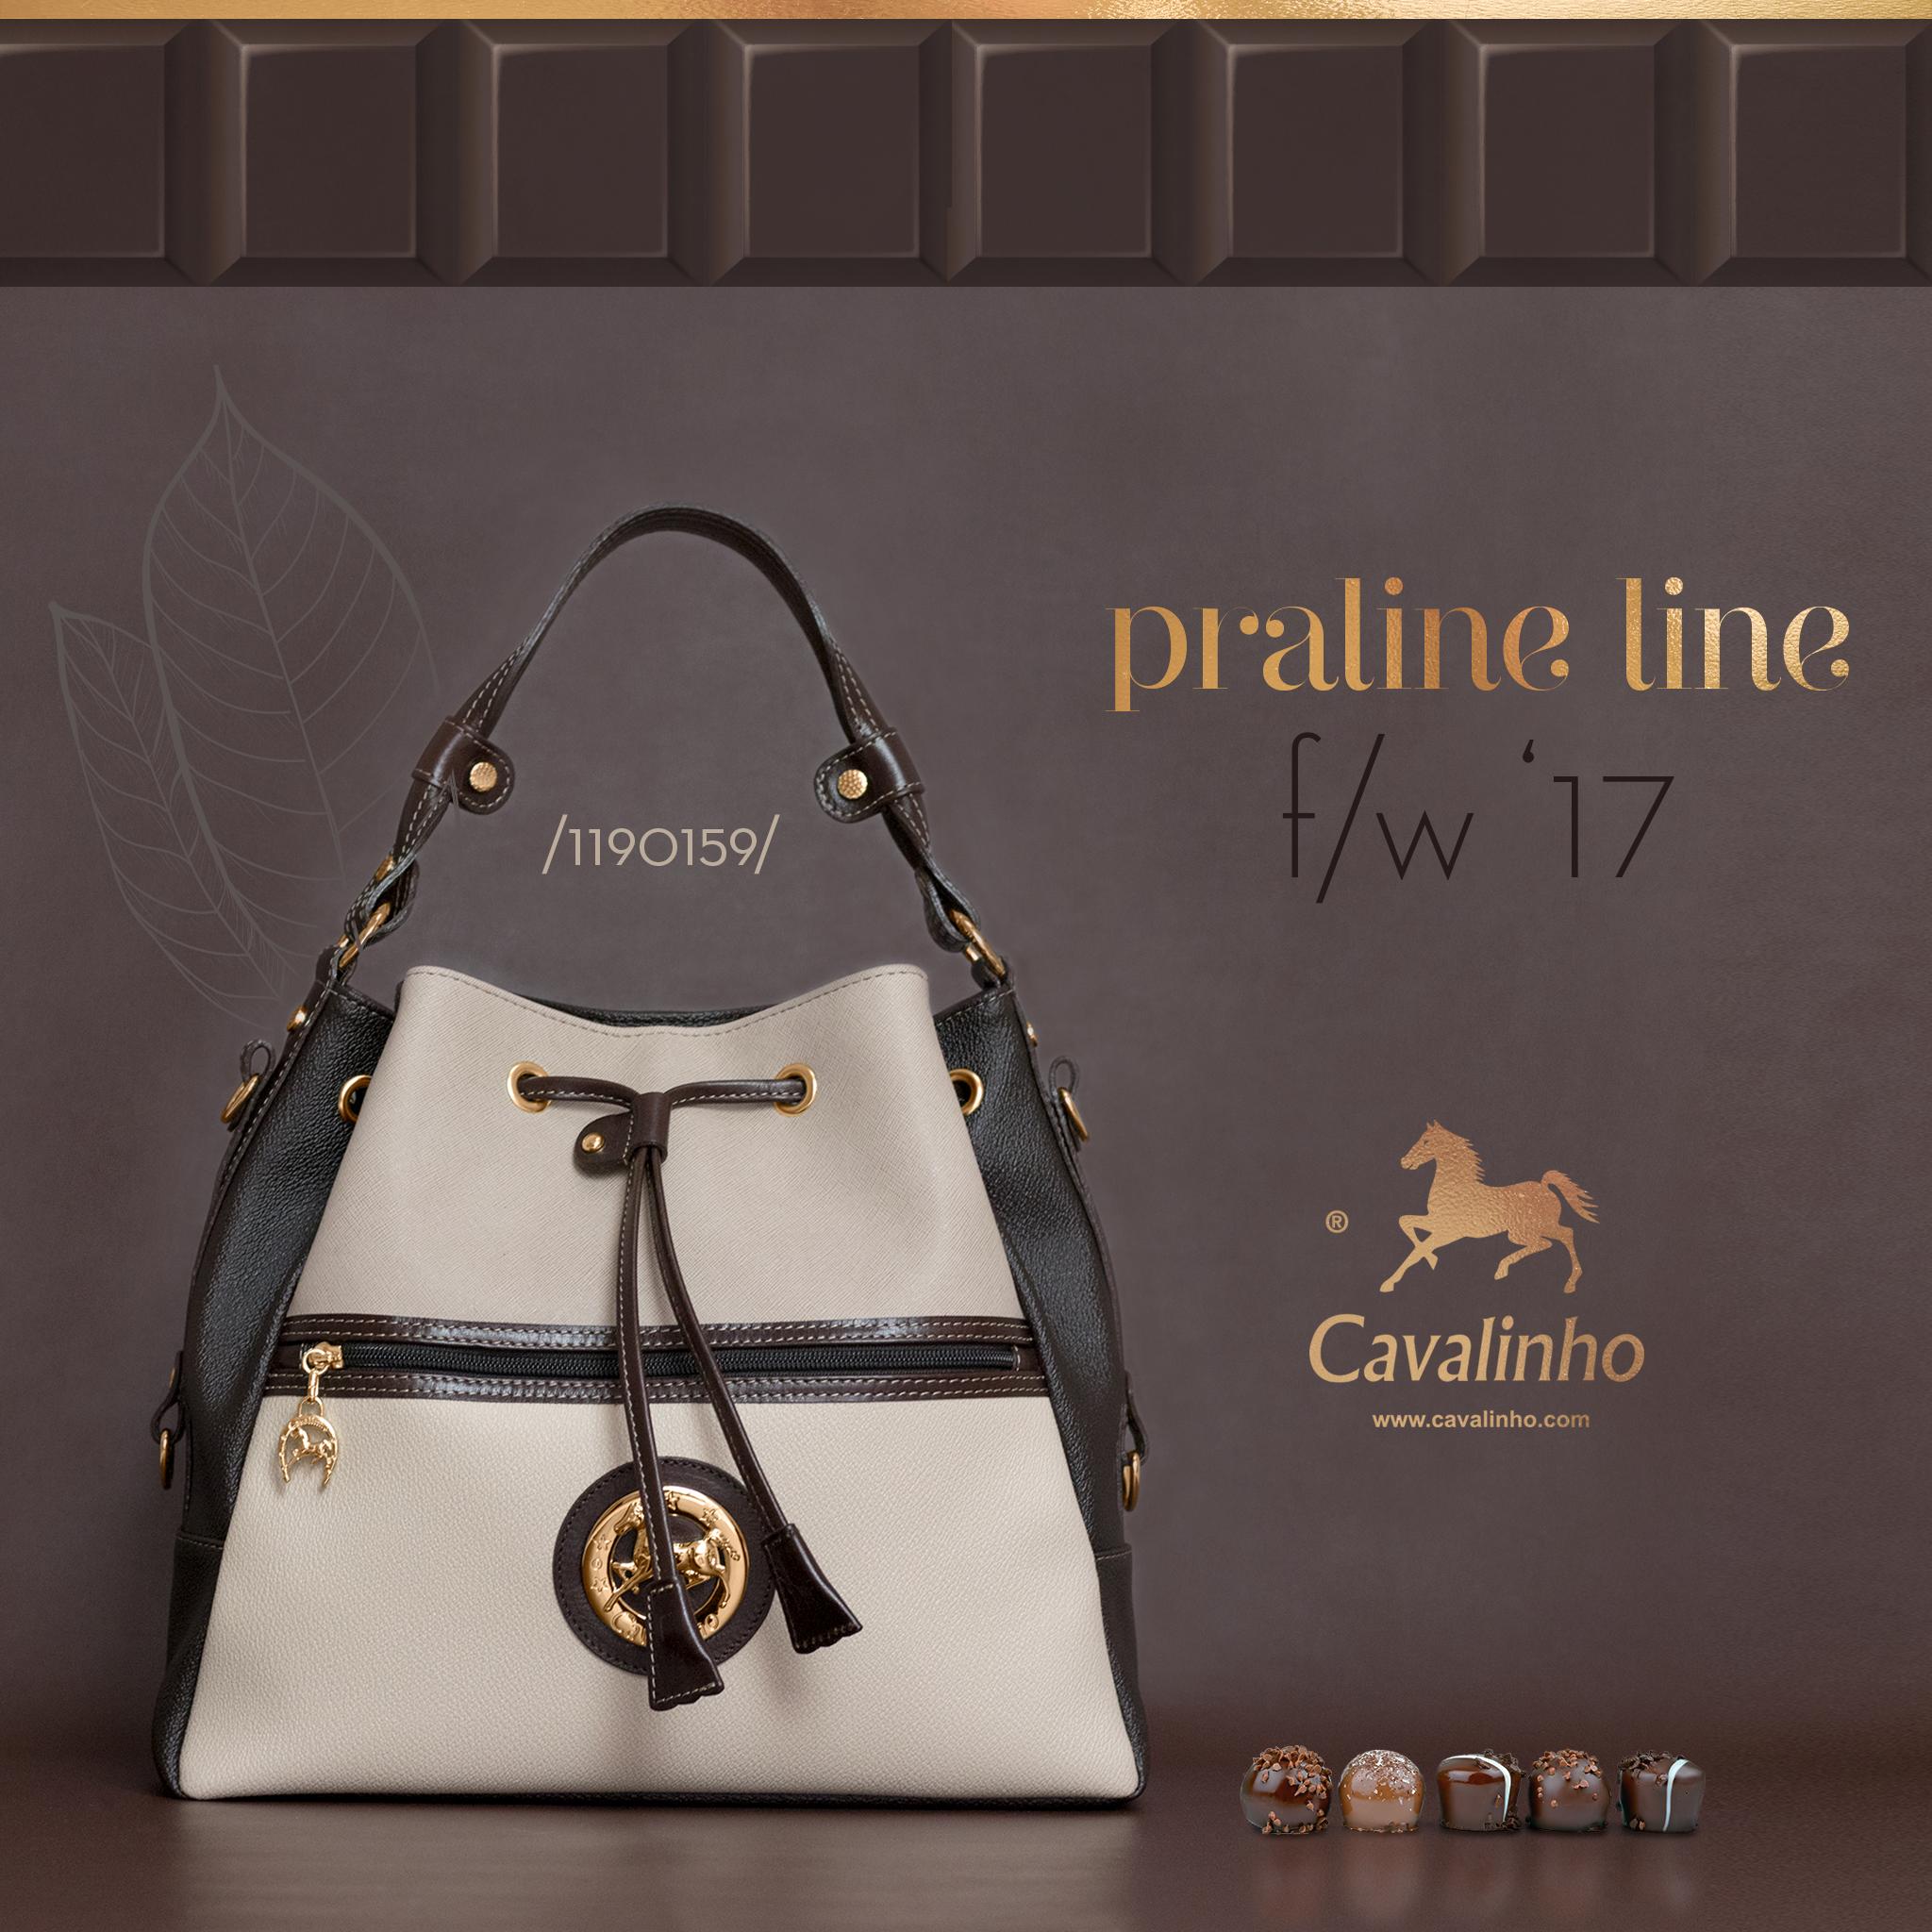 praline3